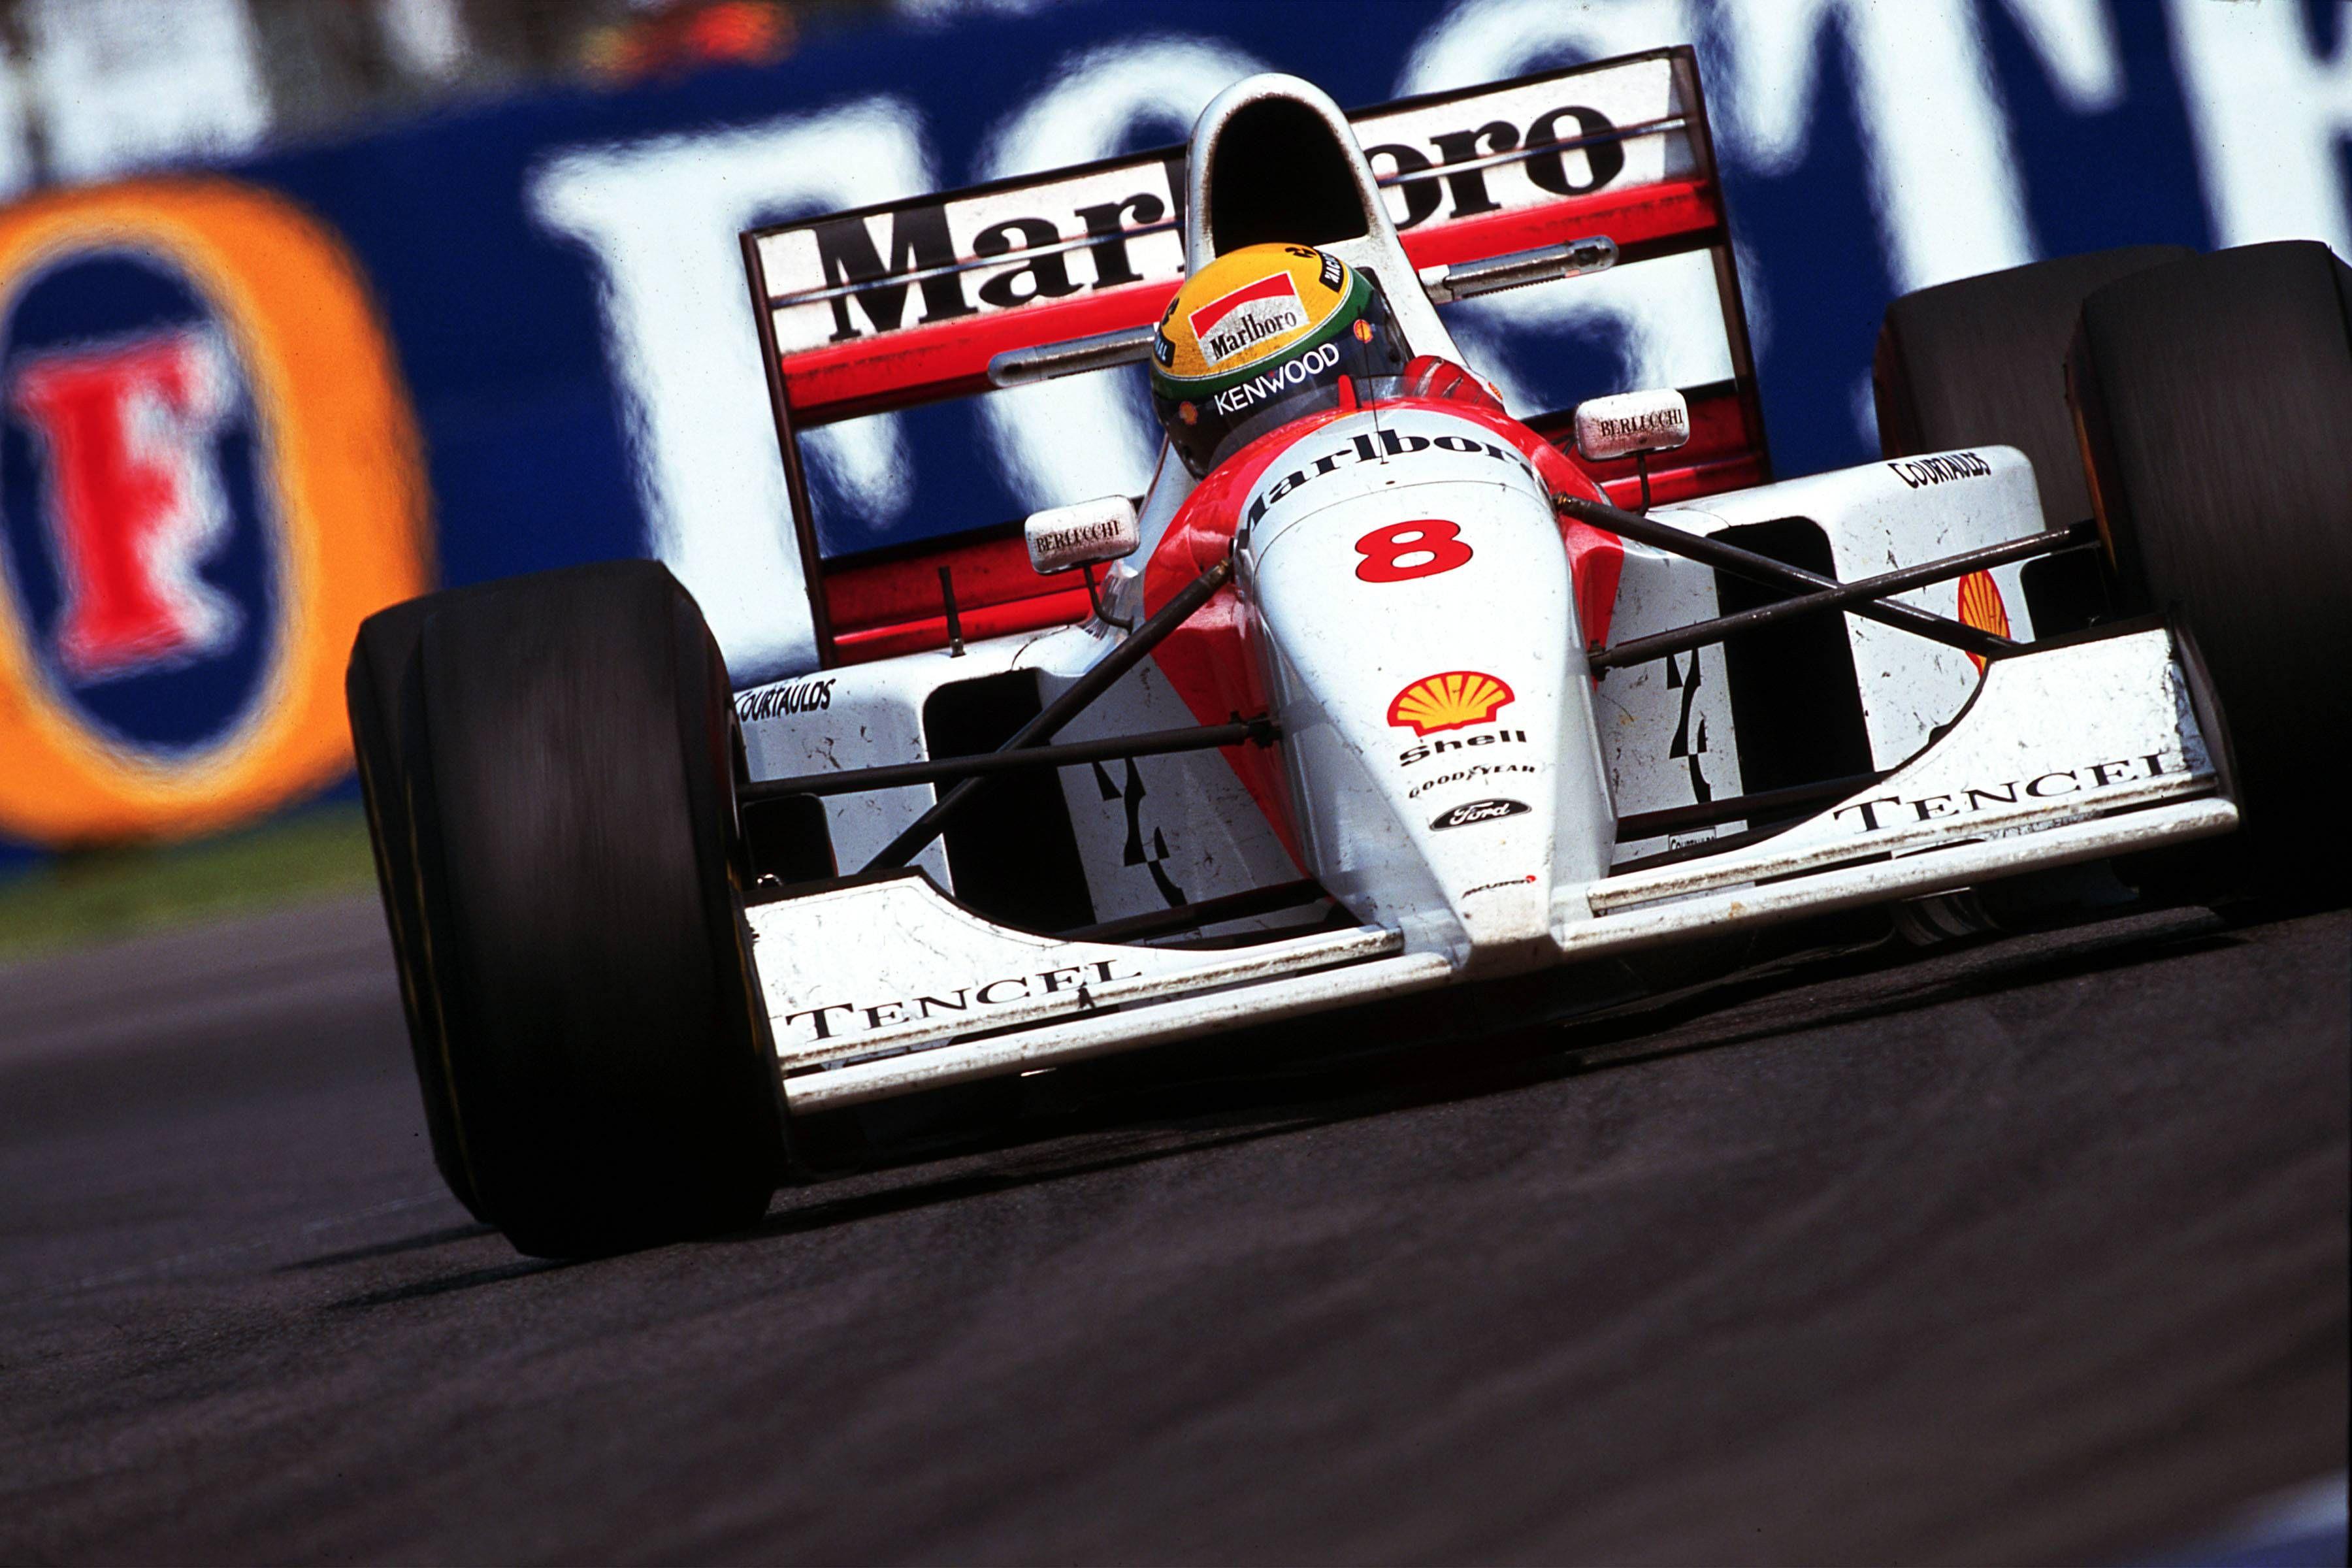 1993 Australian GP, Ayrton Senna, MP44